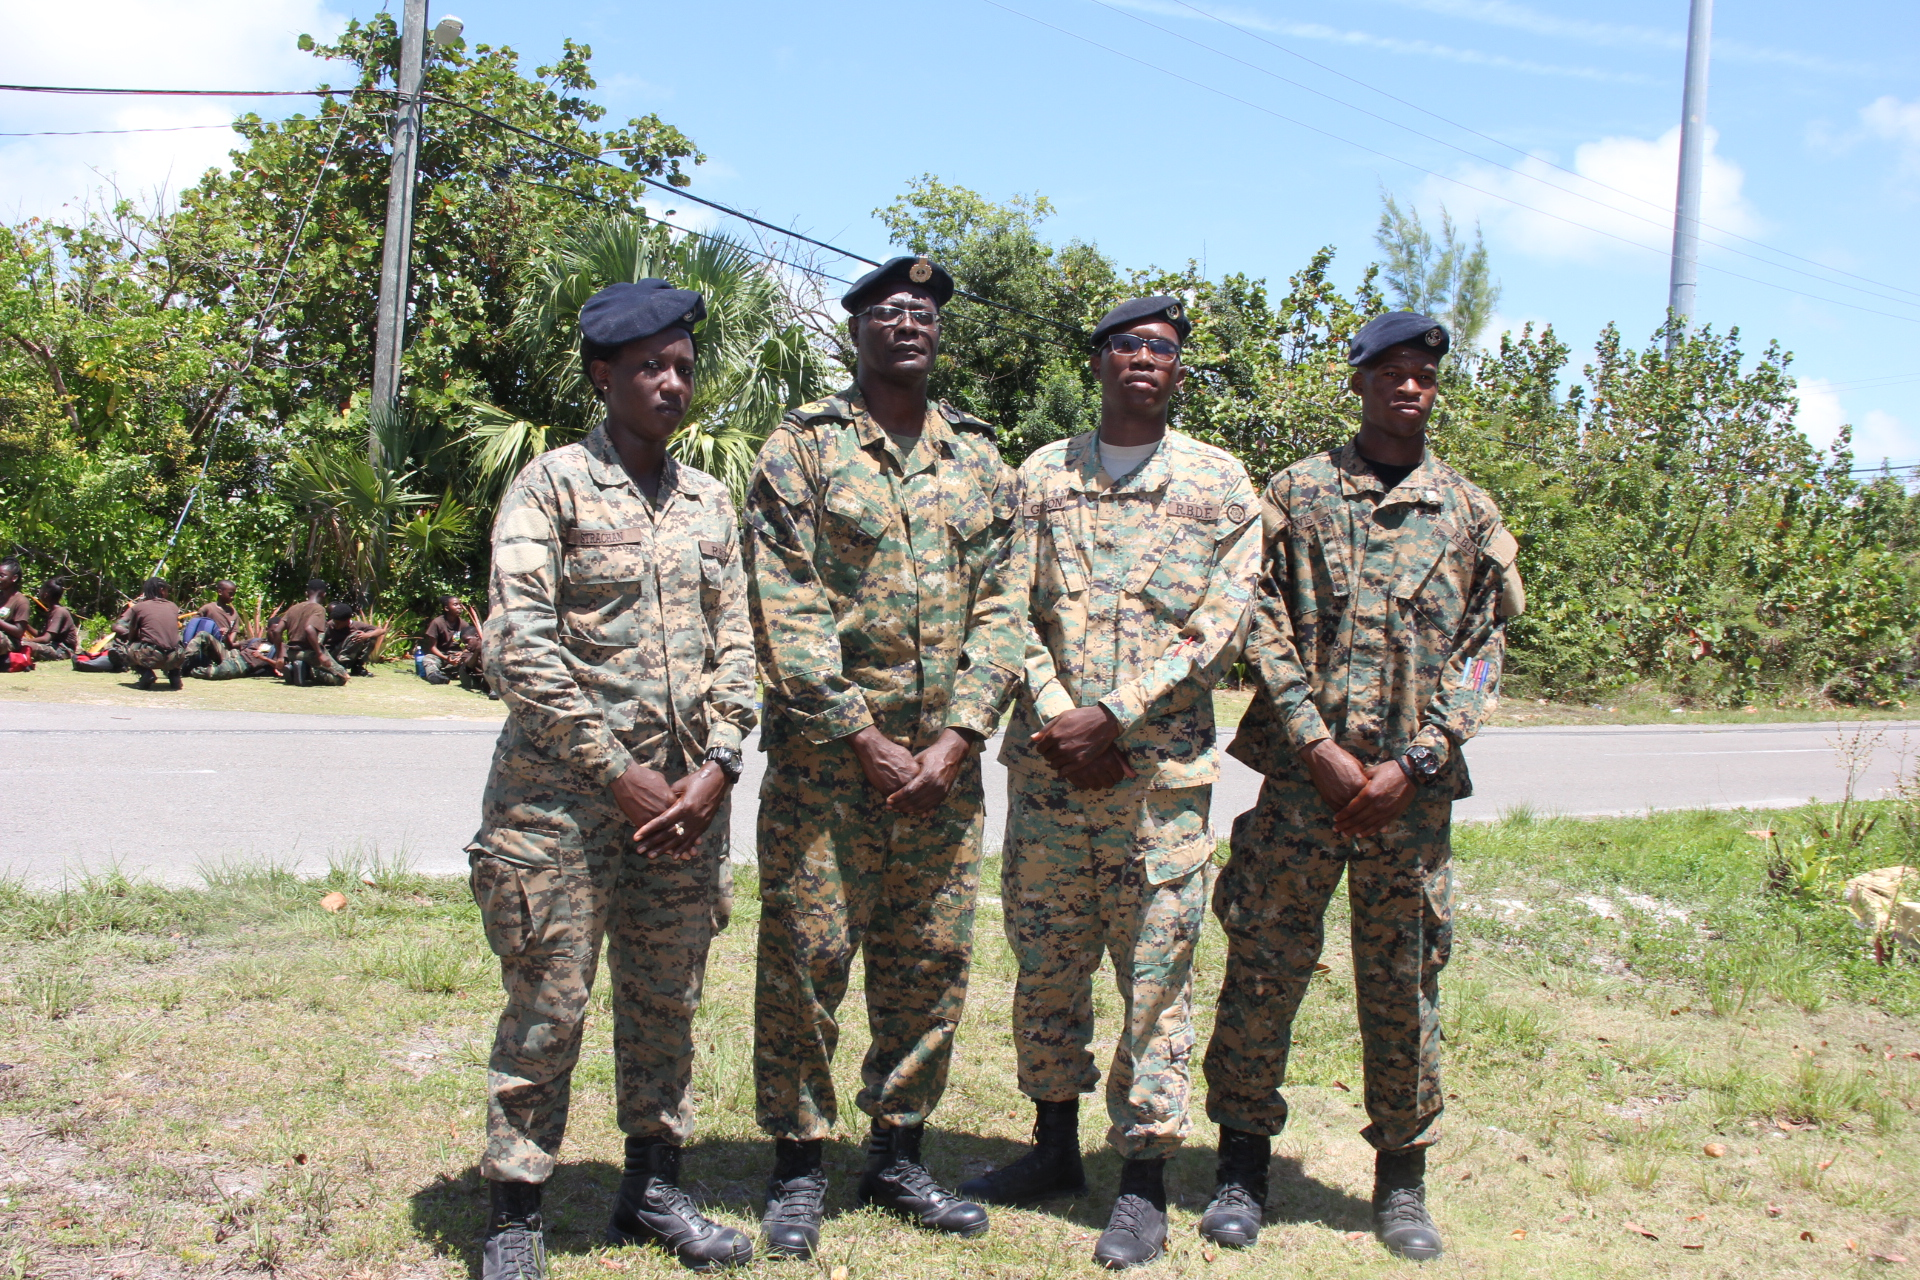 RBDF Rangers Instructors intervene to prevent suicide attempt